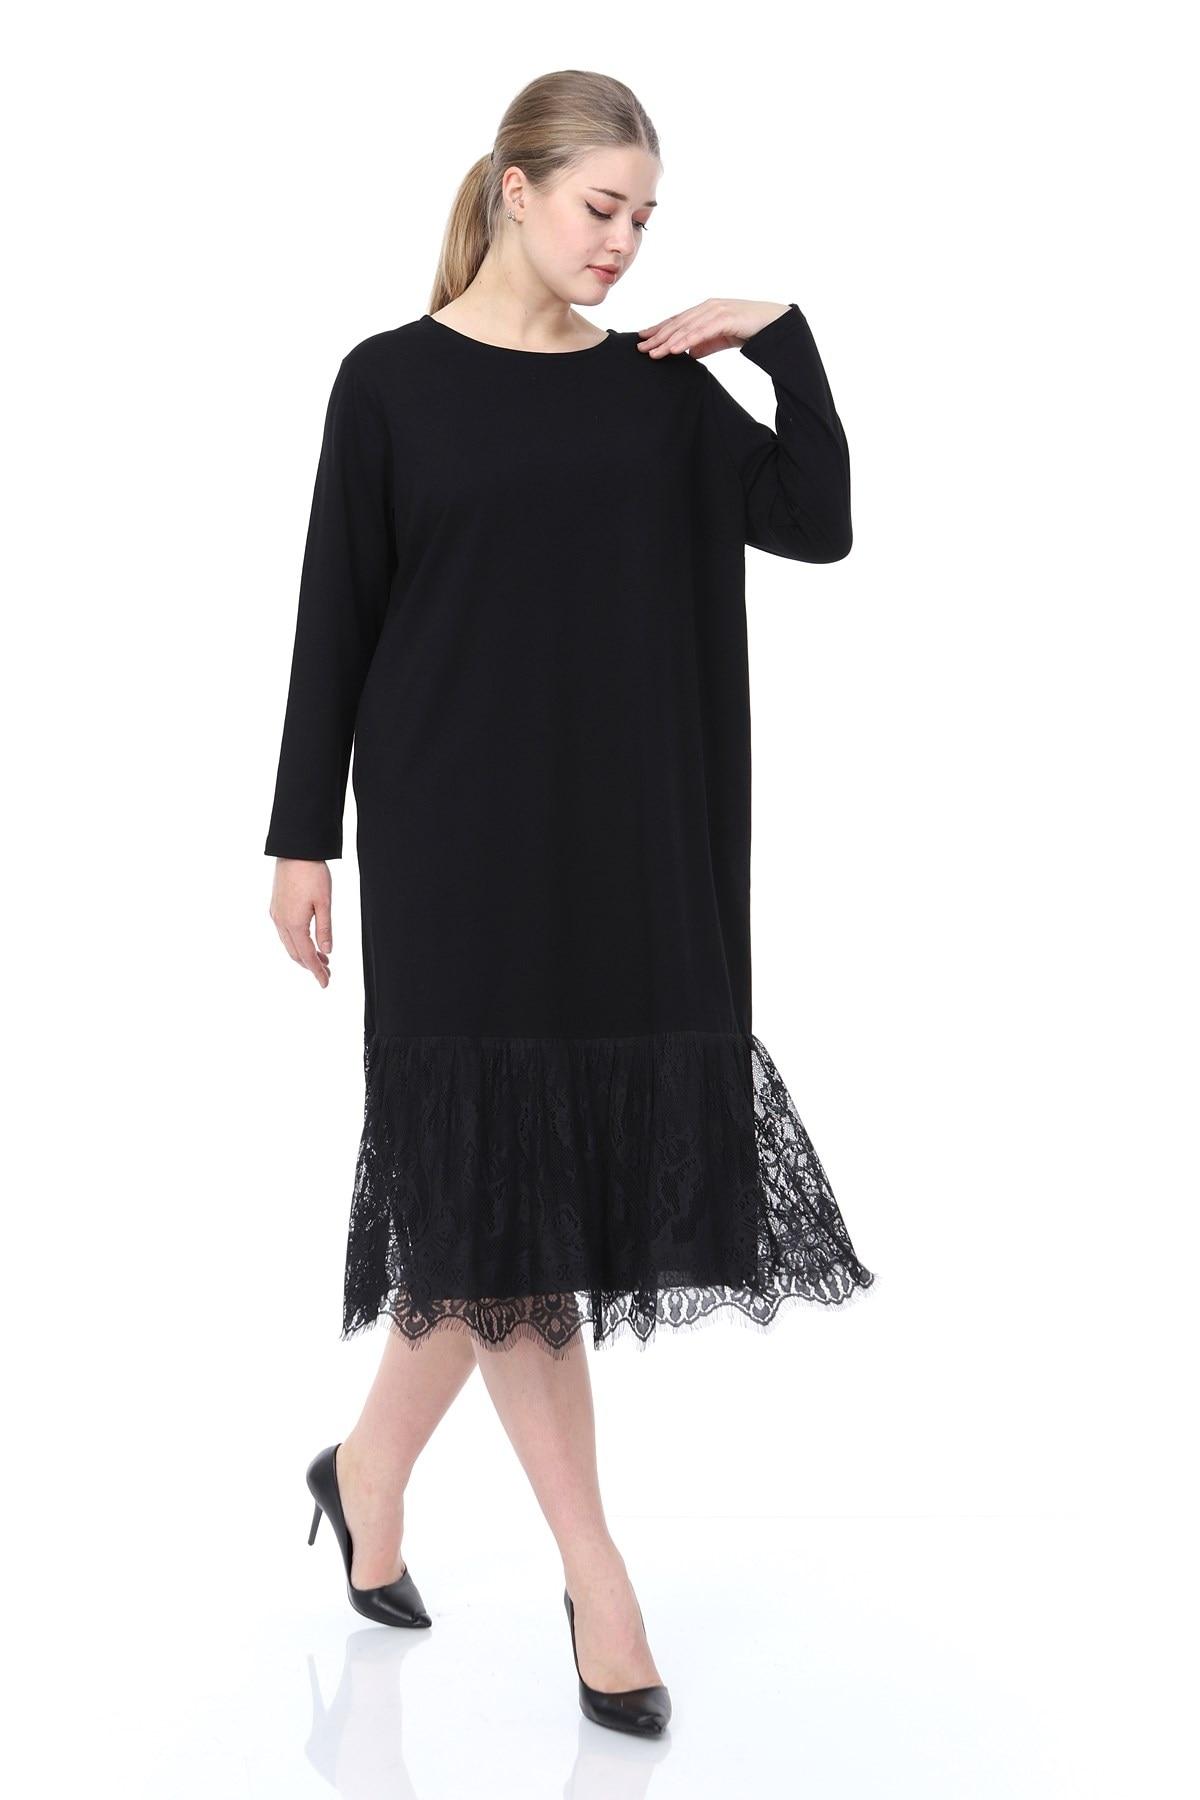 Women's Plus Size Long Sleeve Lace Detail Dress Black L1607